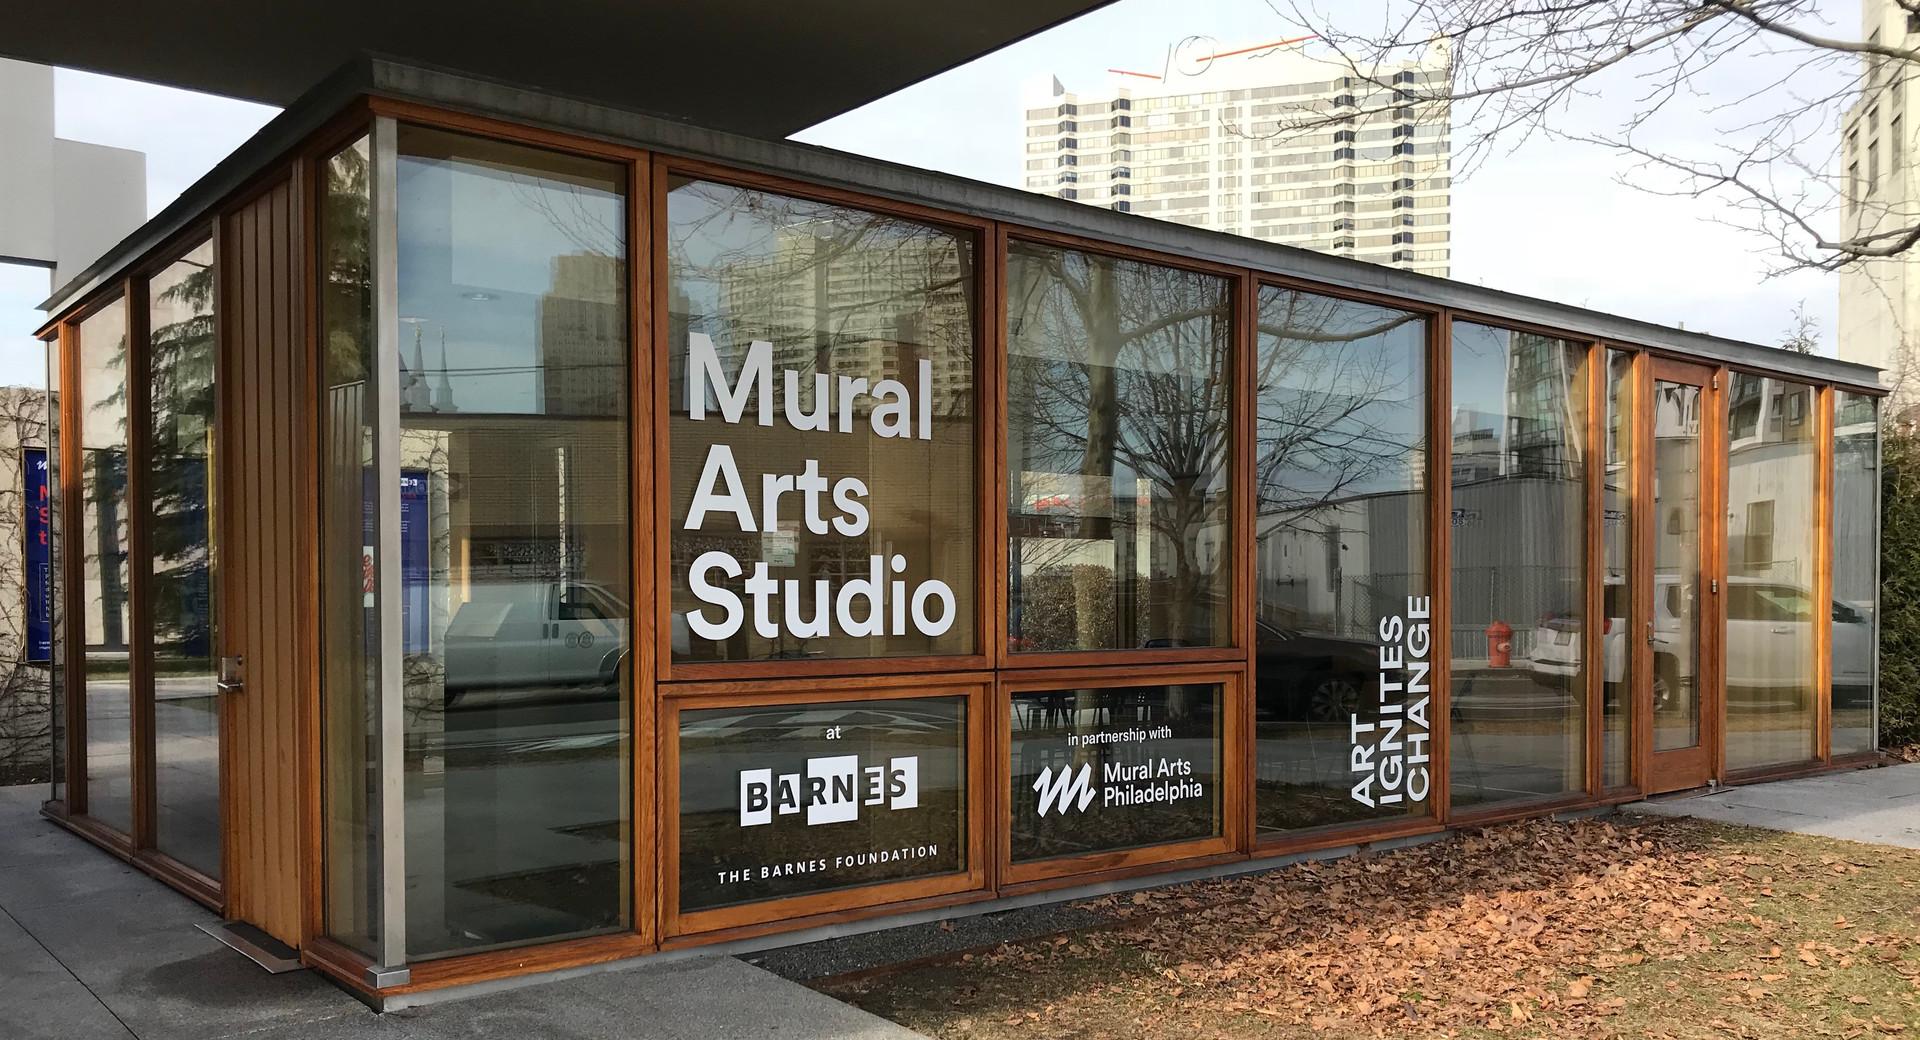 Mural Arts Studio at the Barnes